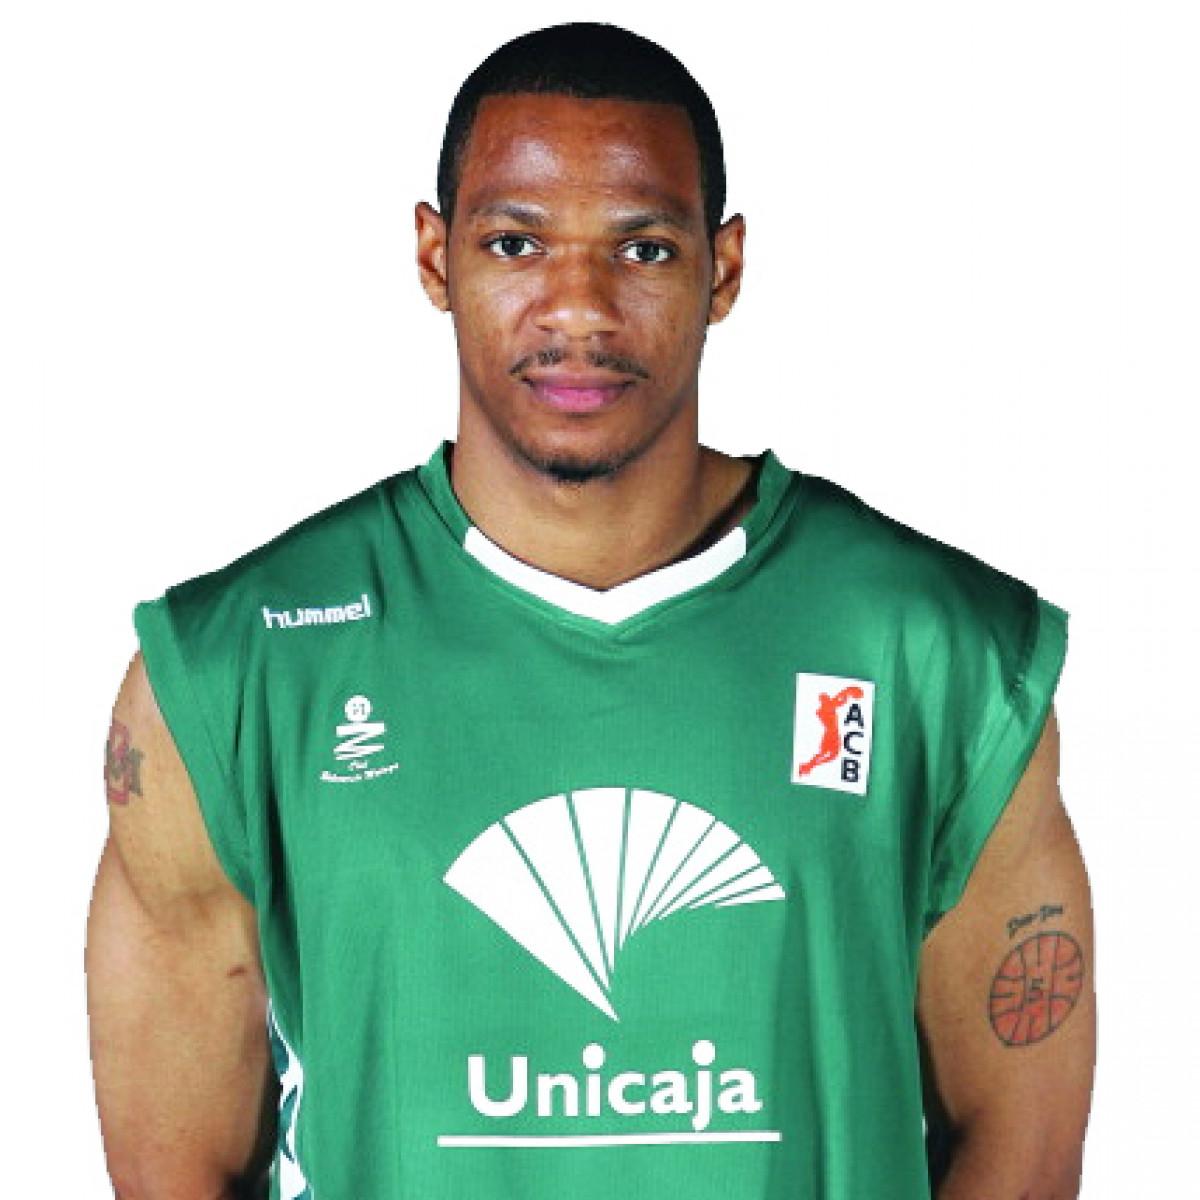 Photo of Marcus Brown, 2005-2006 season